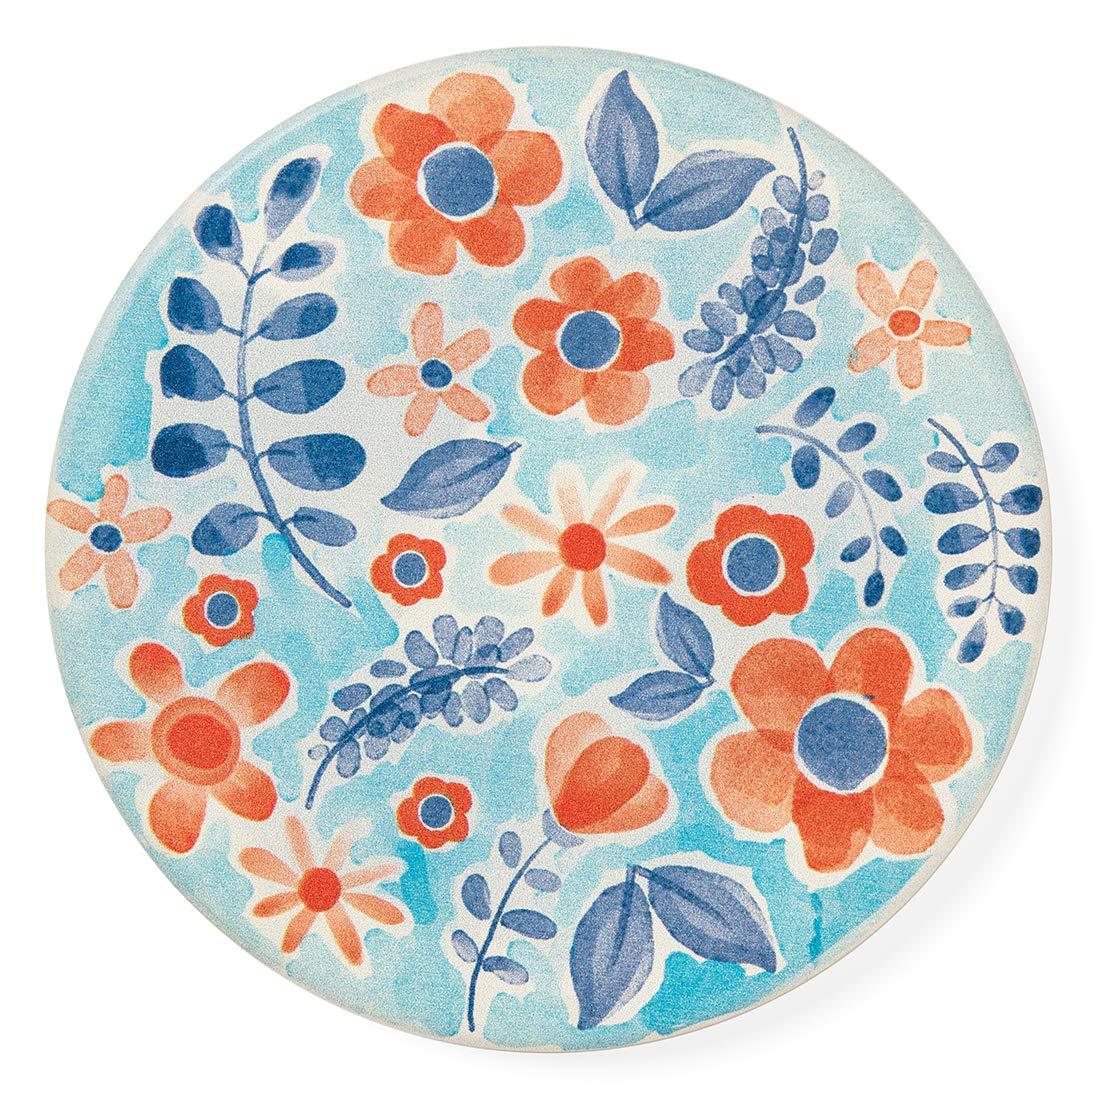 Juego de 4 posavasos de cer/ámica 4 pulgadas de di/ámetro /¡Agregue estilo a su comedor o sala de estar! Flores de acuarela azul Absorbente de agua! Fondo de corcho